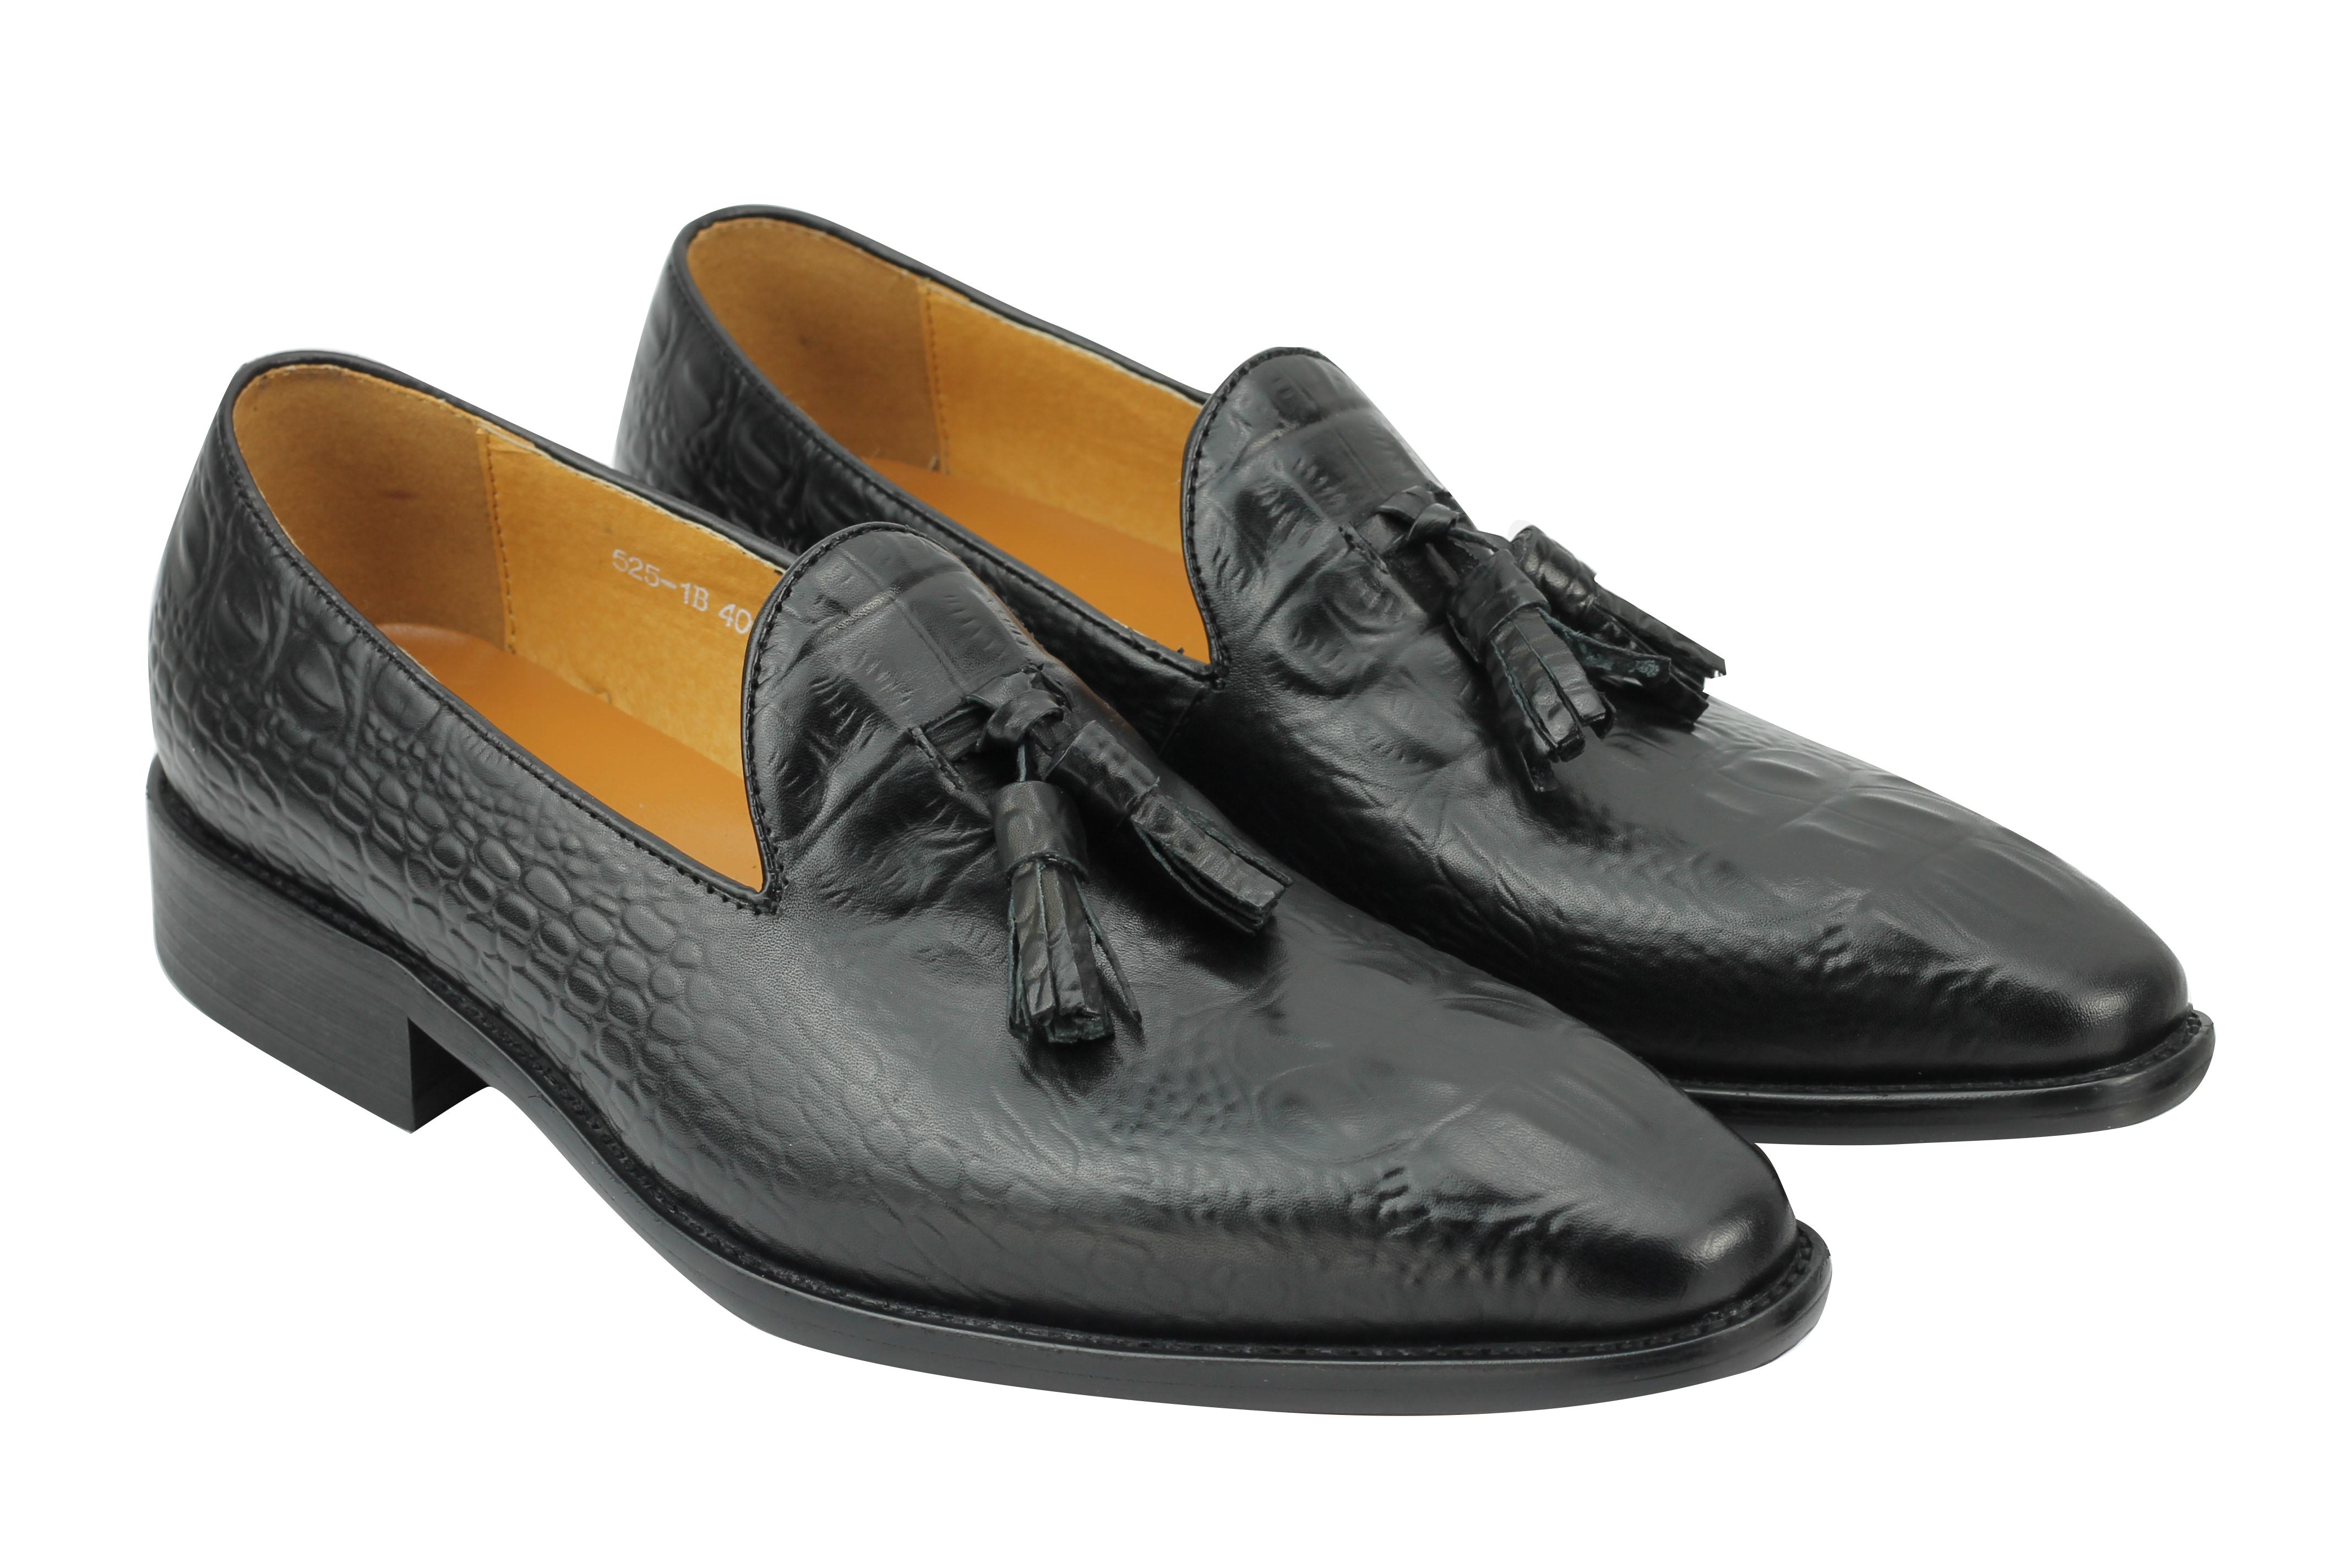 7686b1b7bb7 New Men Black Tan Real Leather Snakeskin Look Tassel Loafers Shoes 6 ...